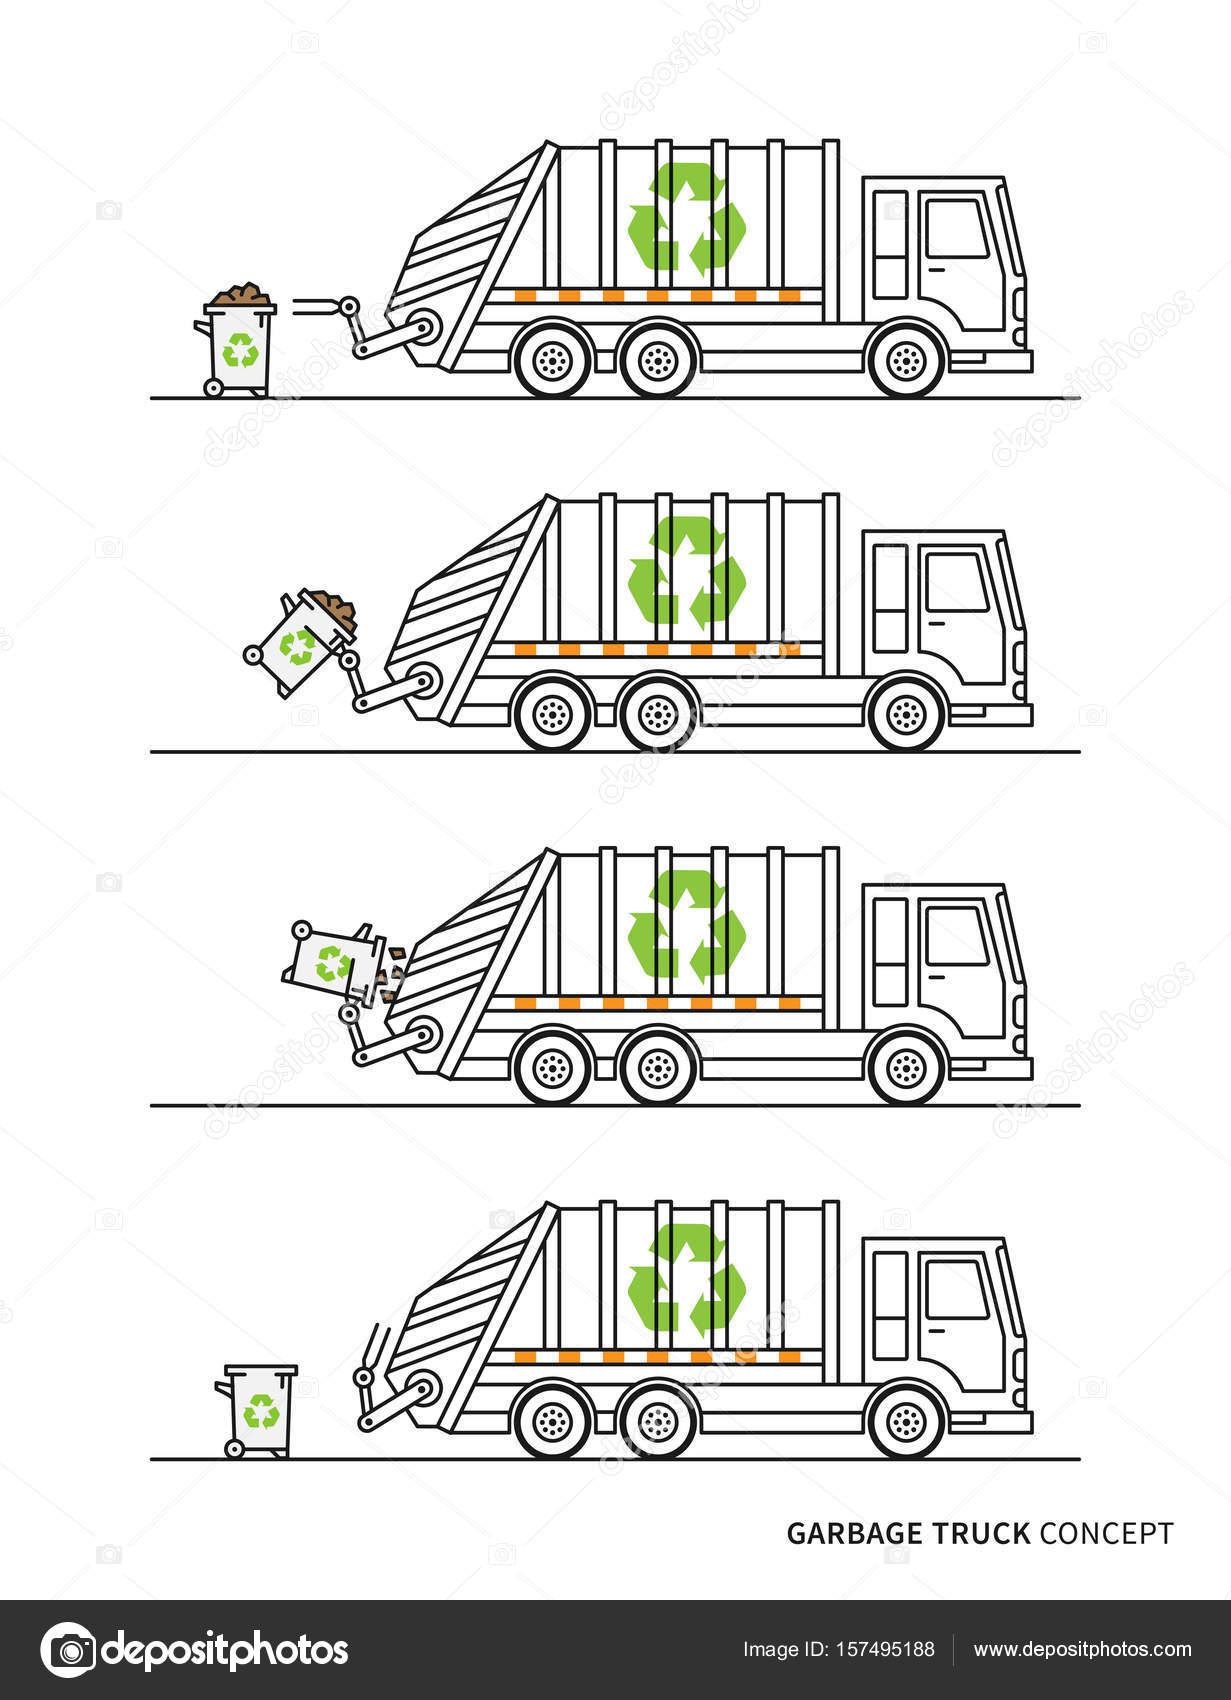 garbage truck diagram best wiring library Garbage Truck Mexico garbage truck vector illustration \u2014 stock vector